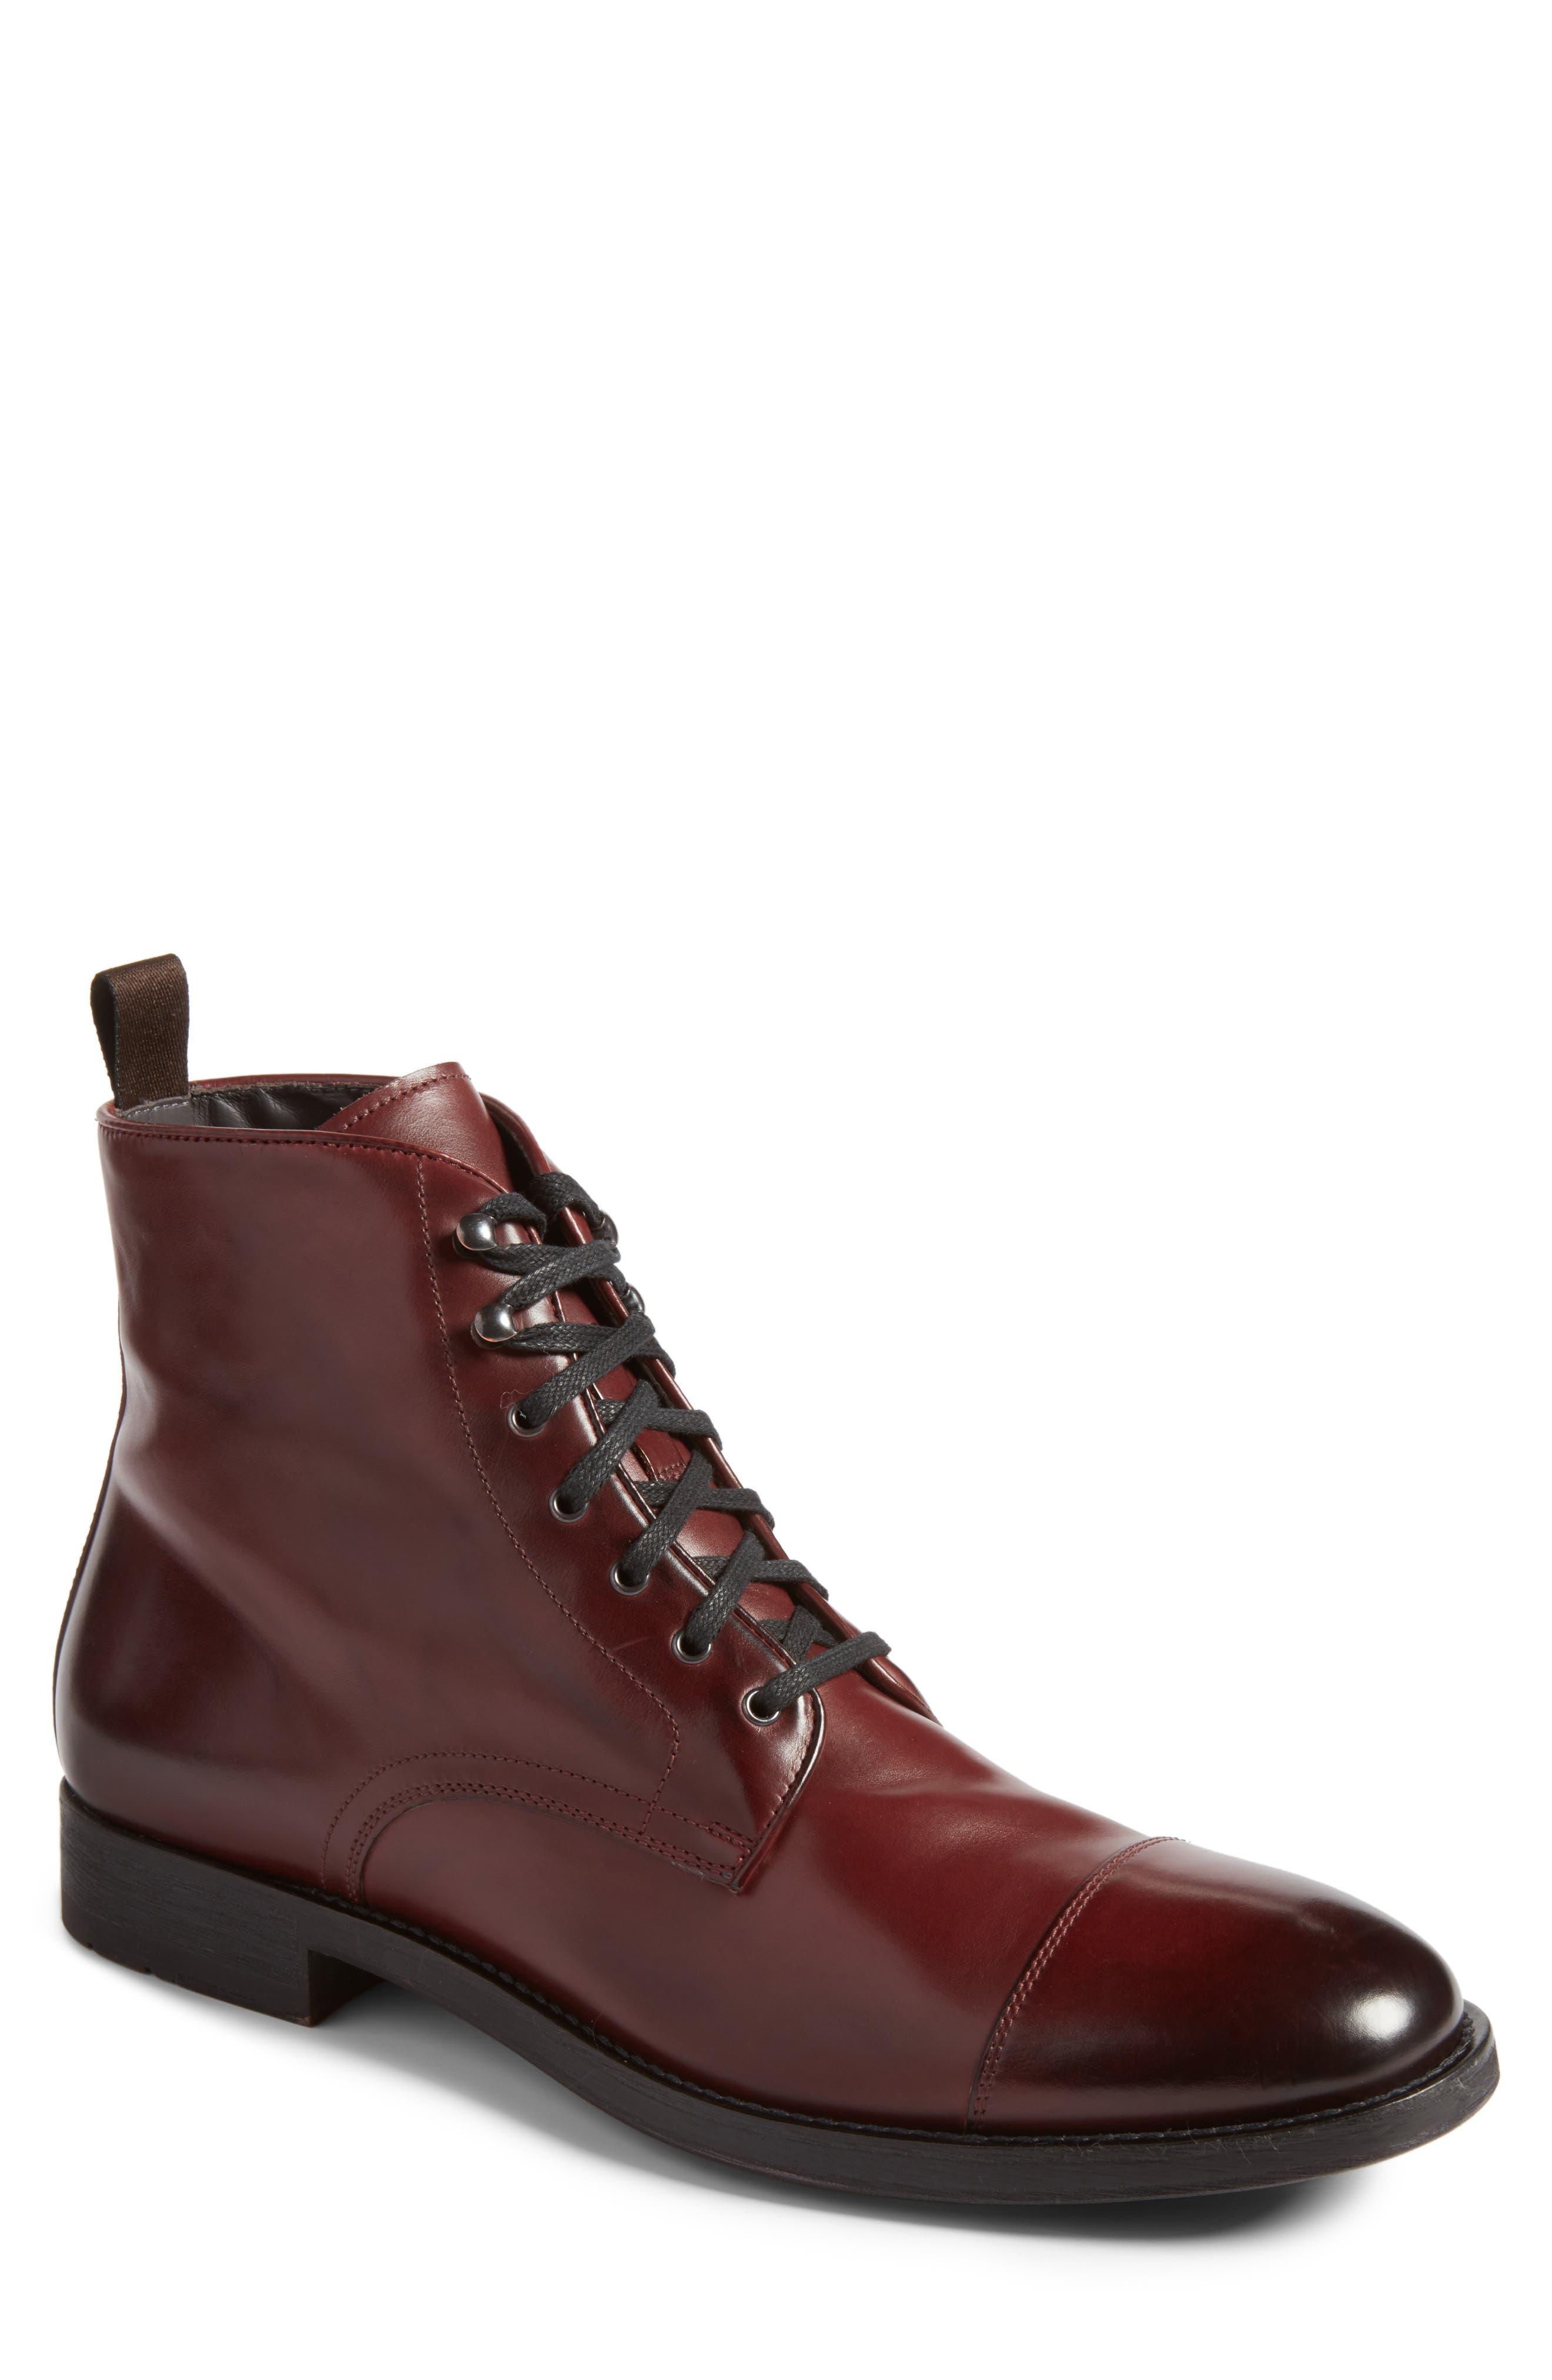 Alternate Image 1 Selected - To Boot New York Bondfield Cap Toe Boot (Men)